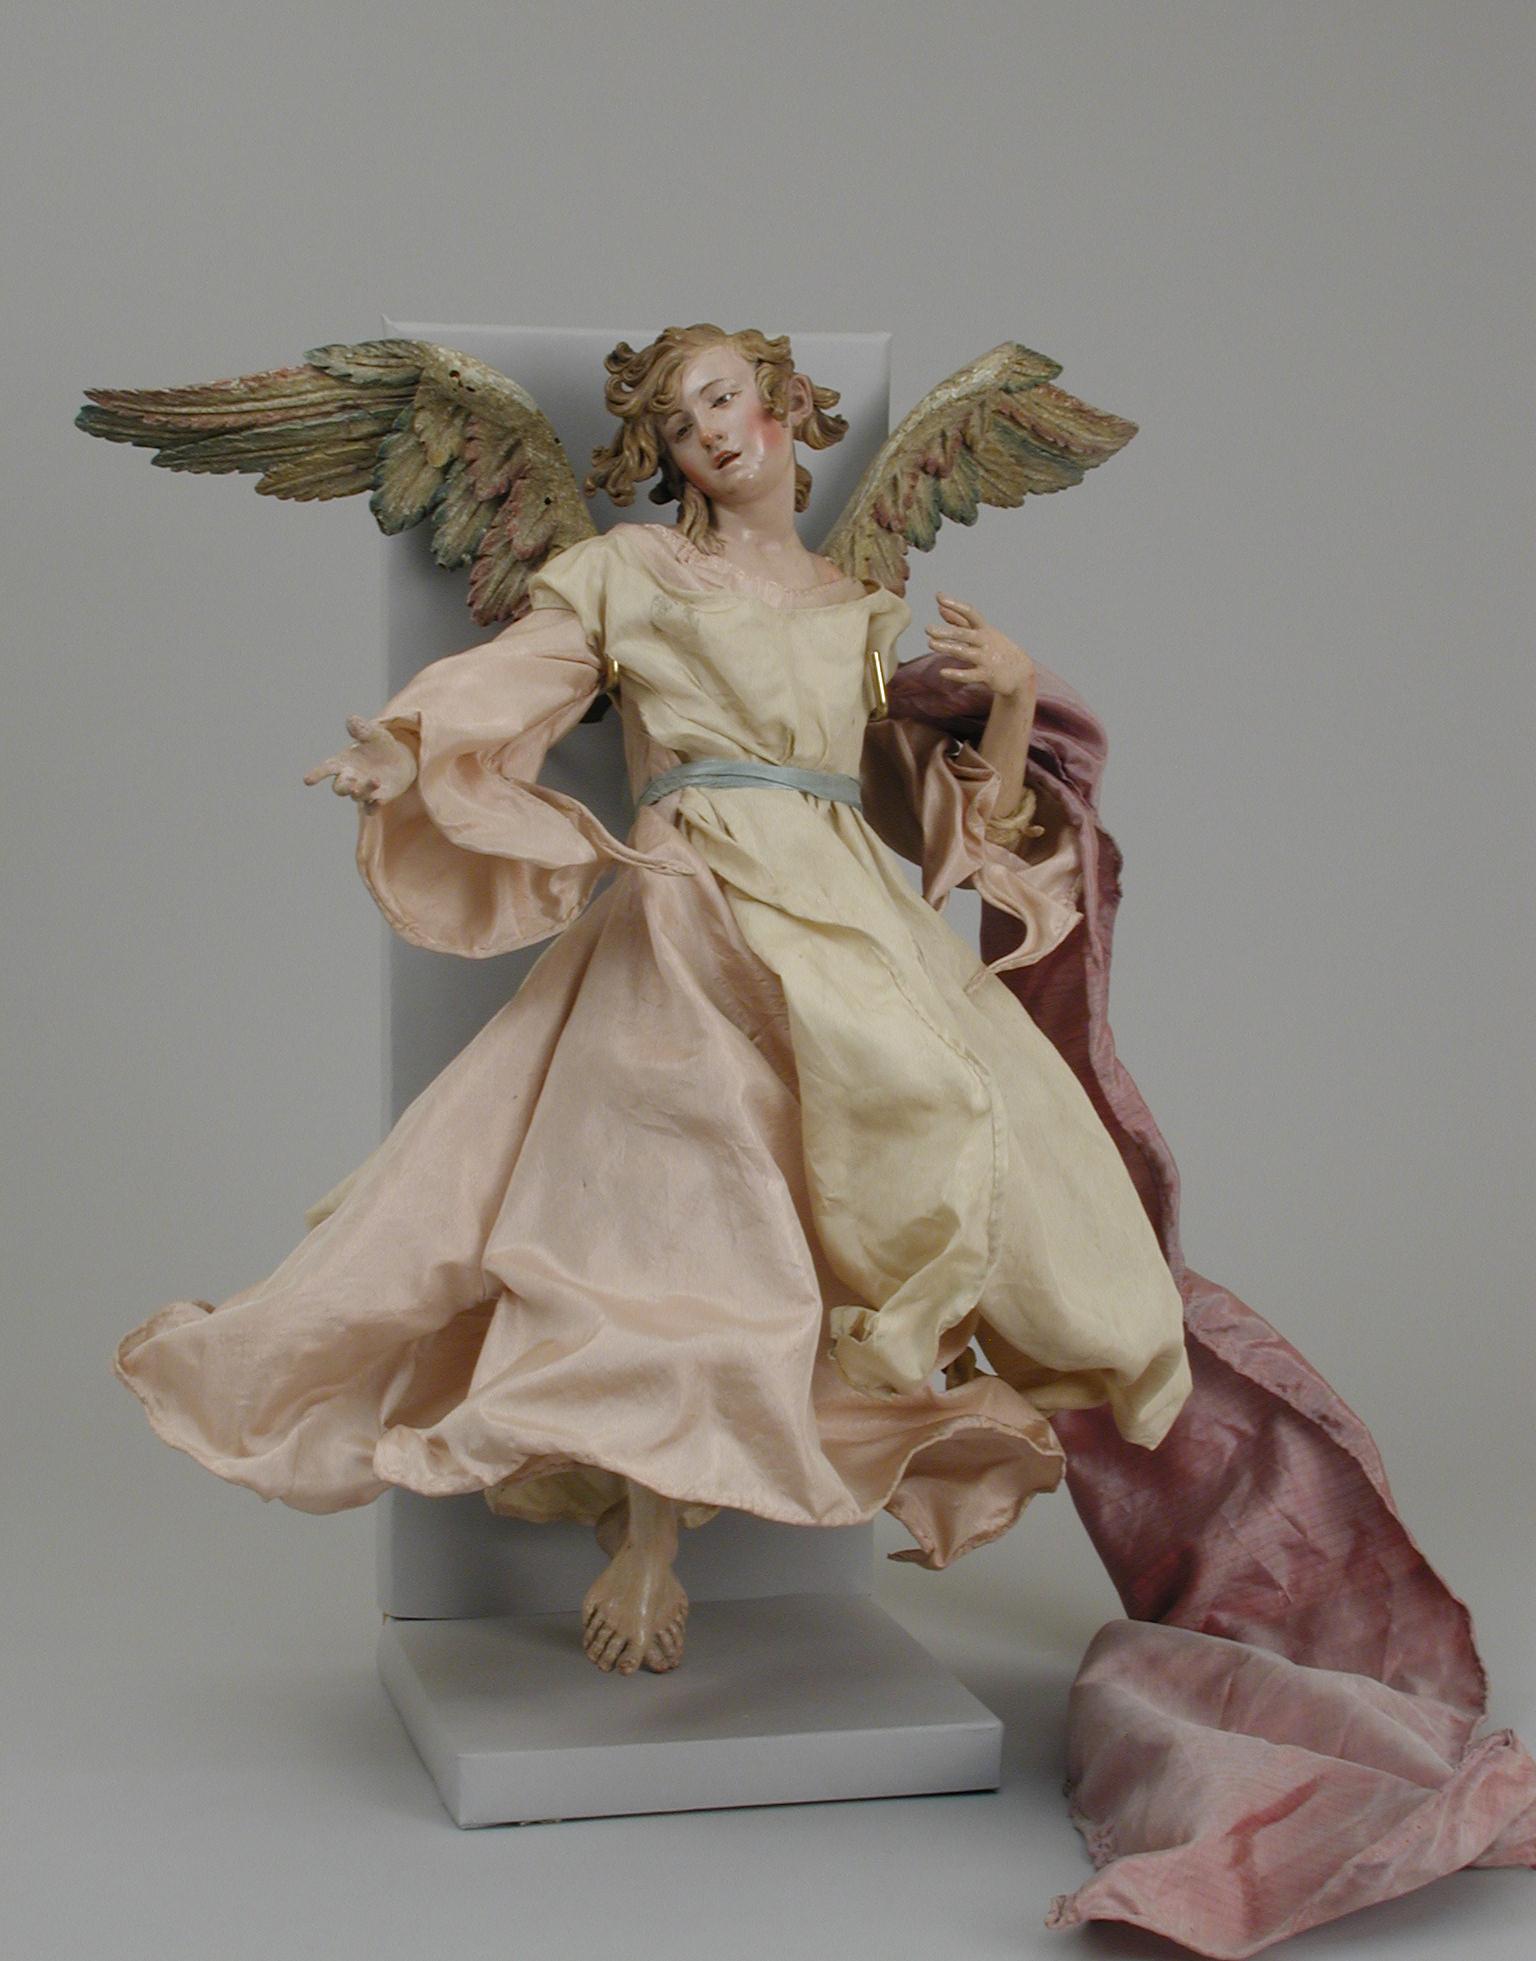 https://images.metmuseum.org/CRDImages/es/original/LC-64_164_9.jpg